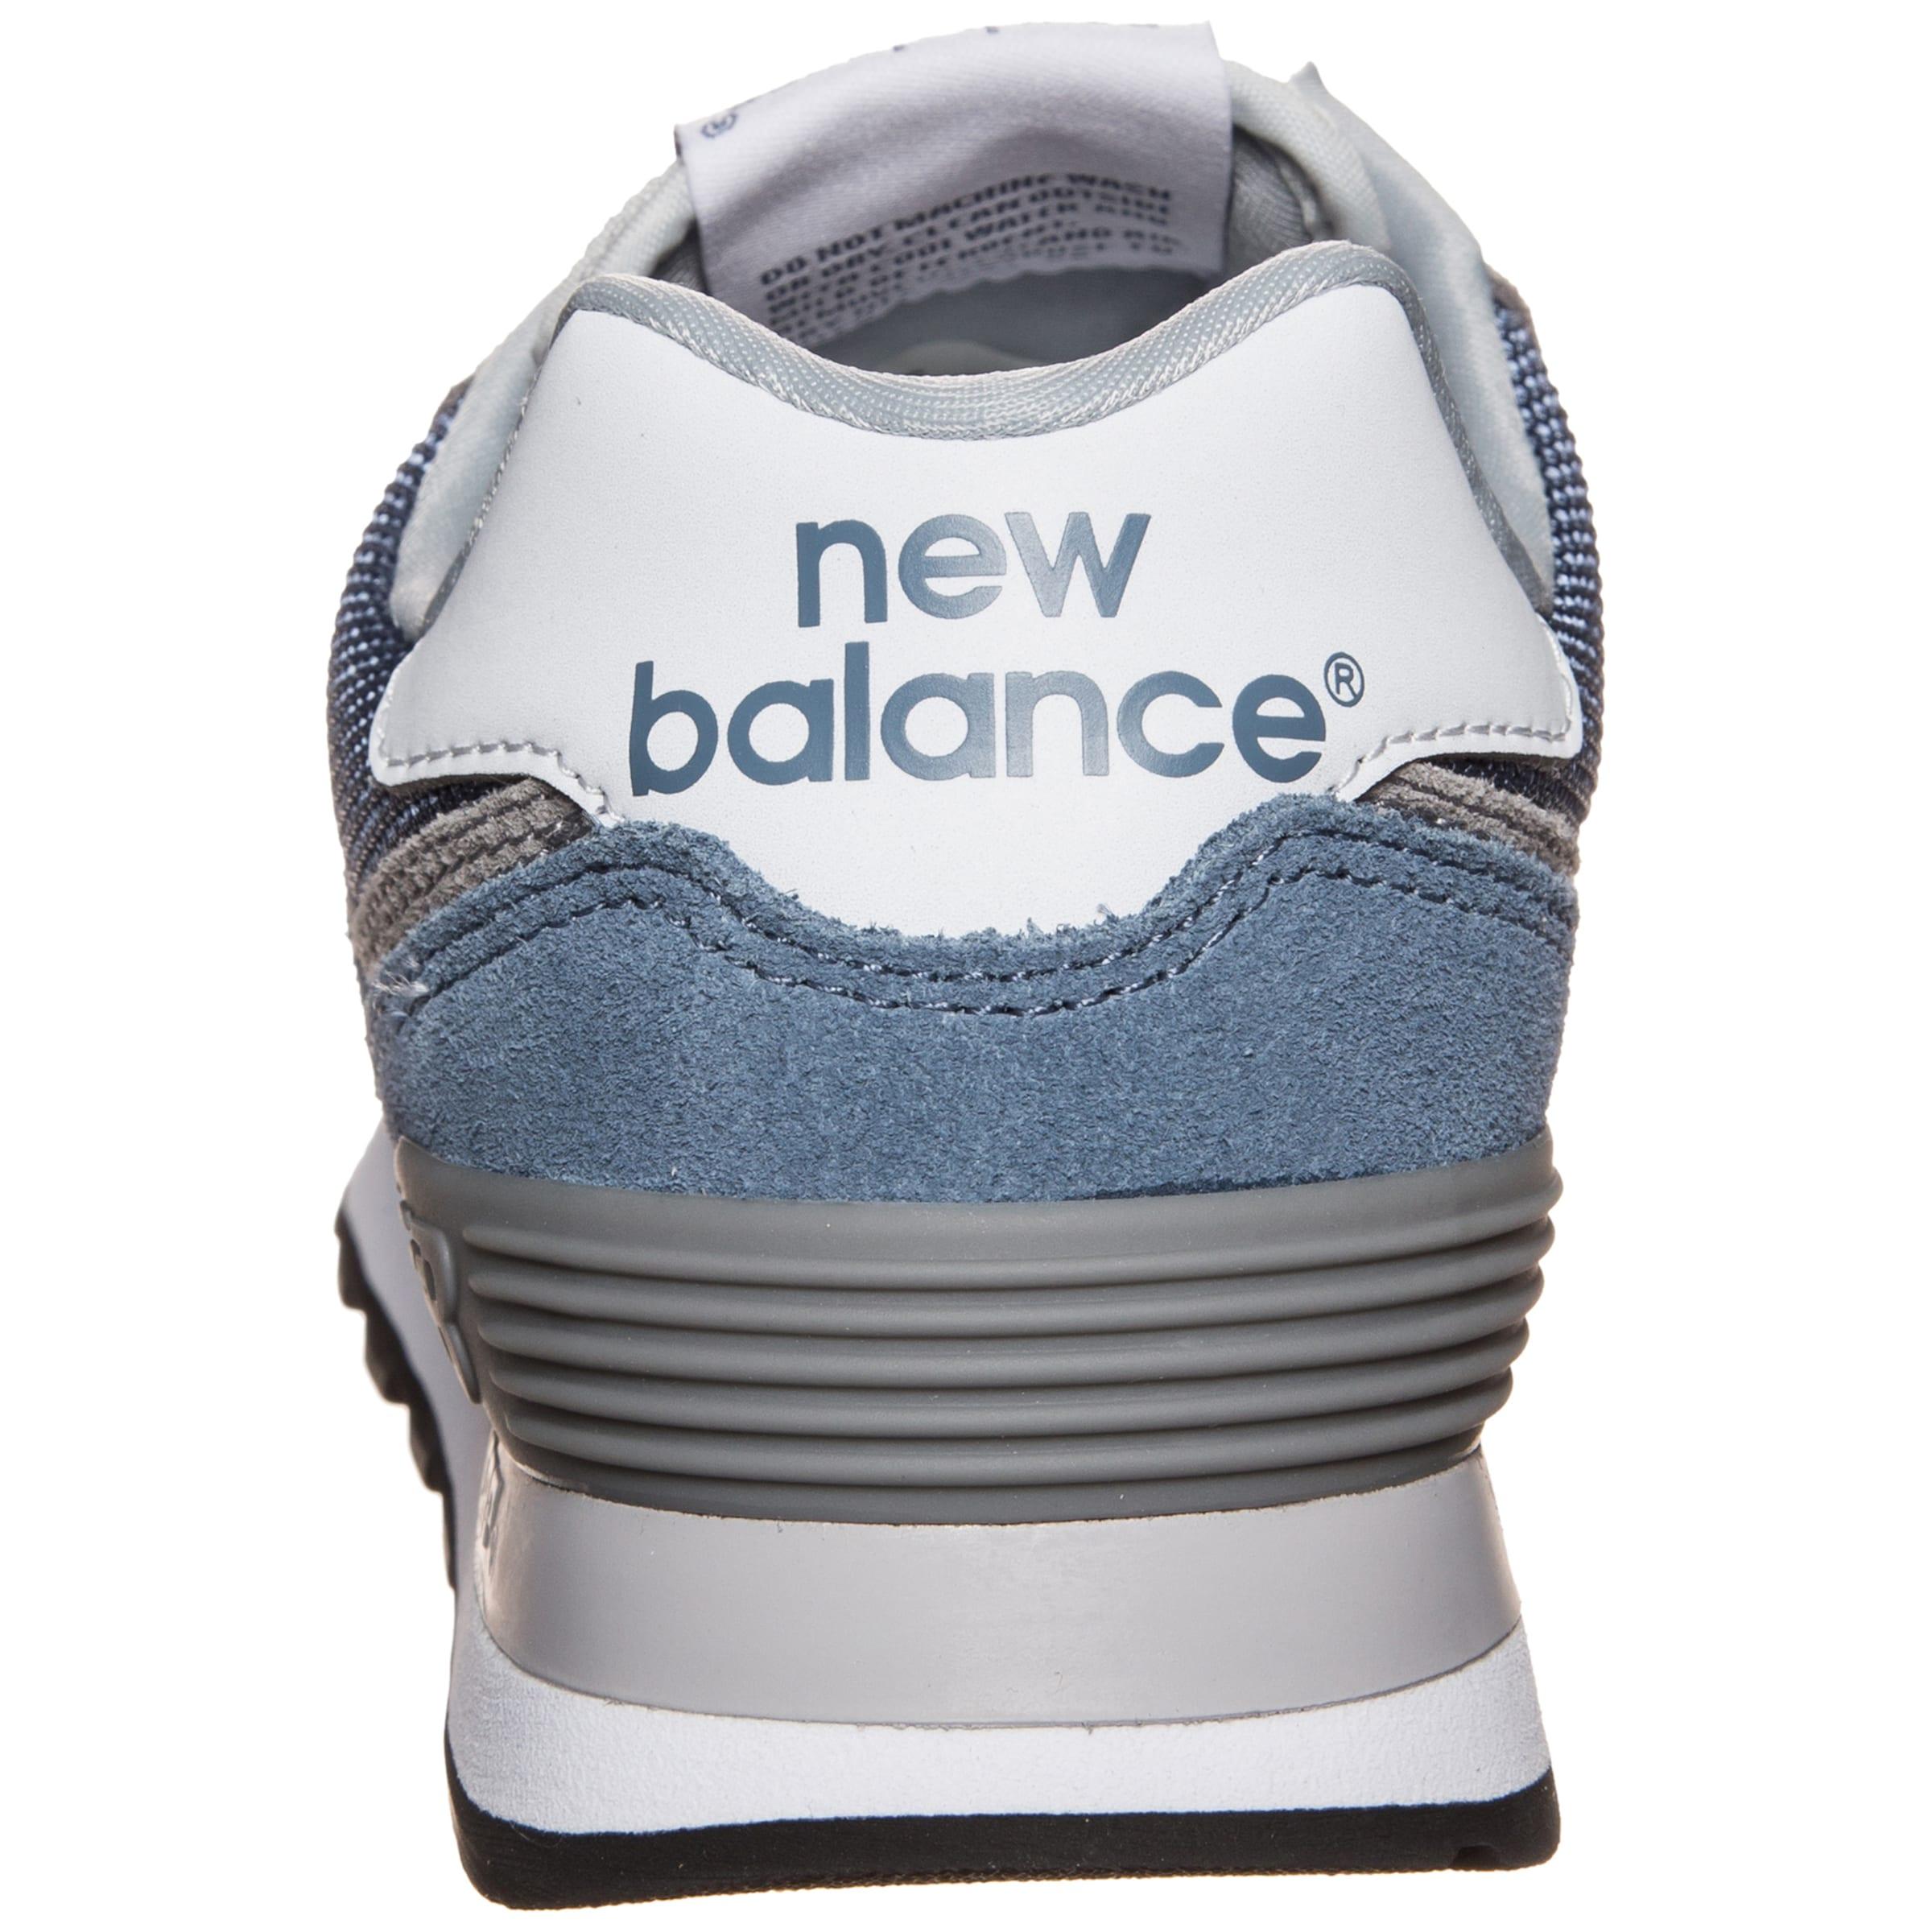 Baskets cc CielBlanc Balance Basses Bleu New 'wl574 b' En xWCBorde